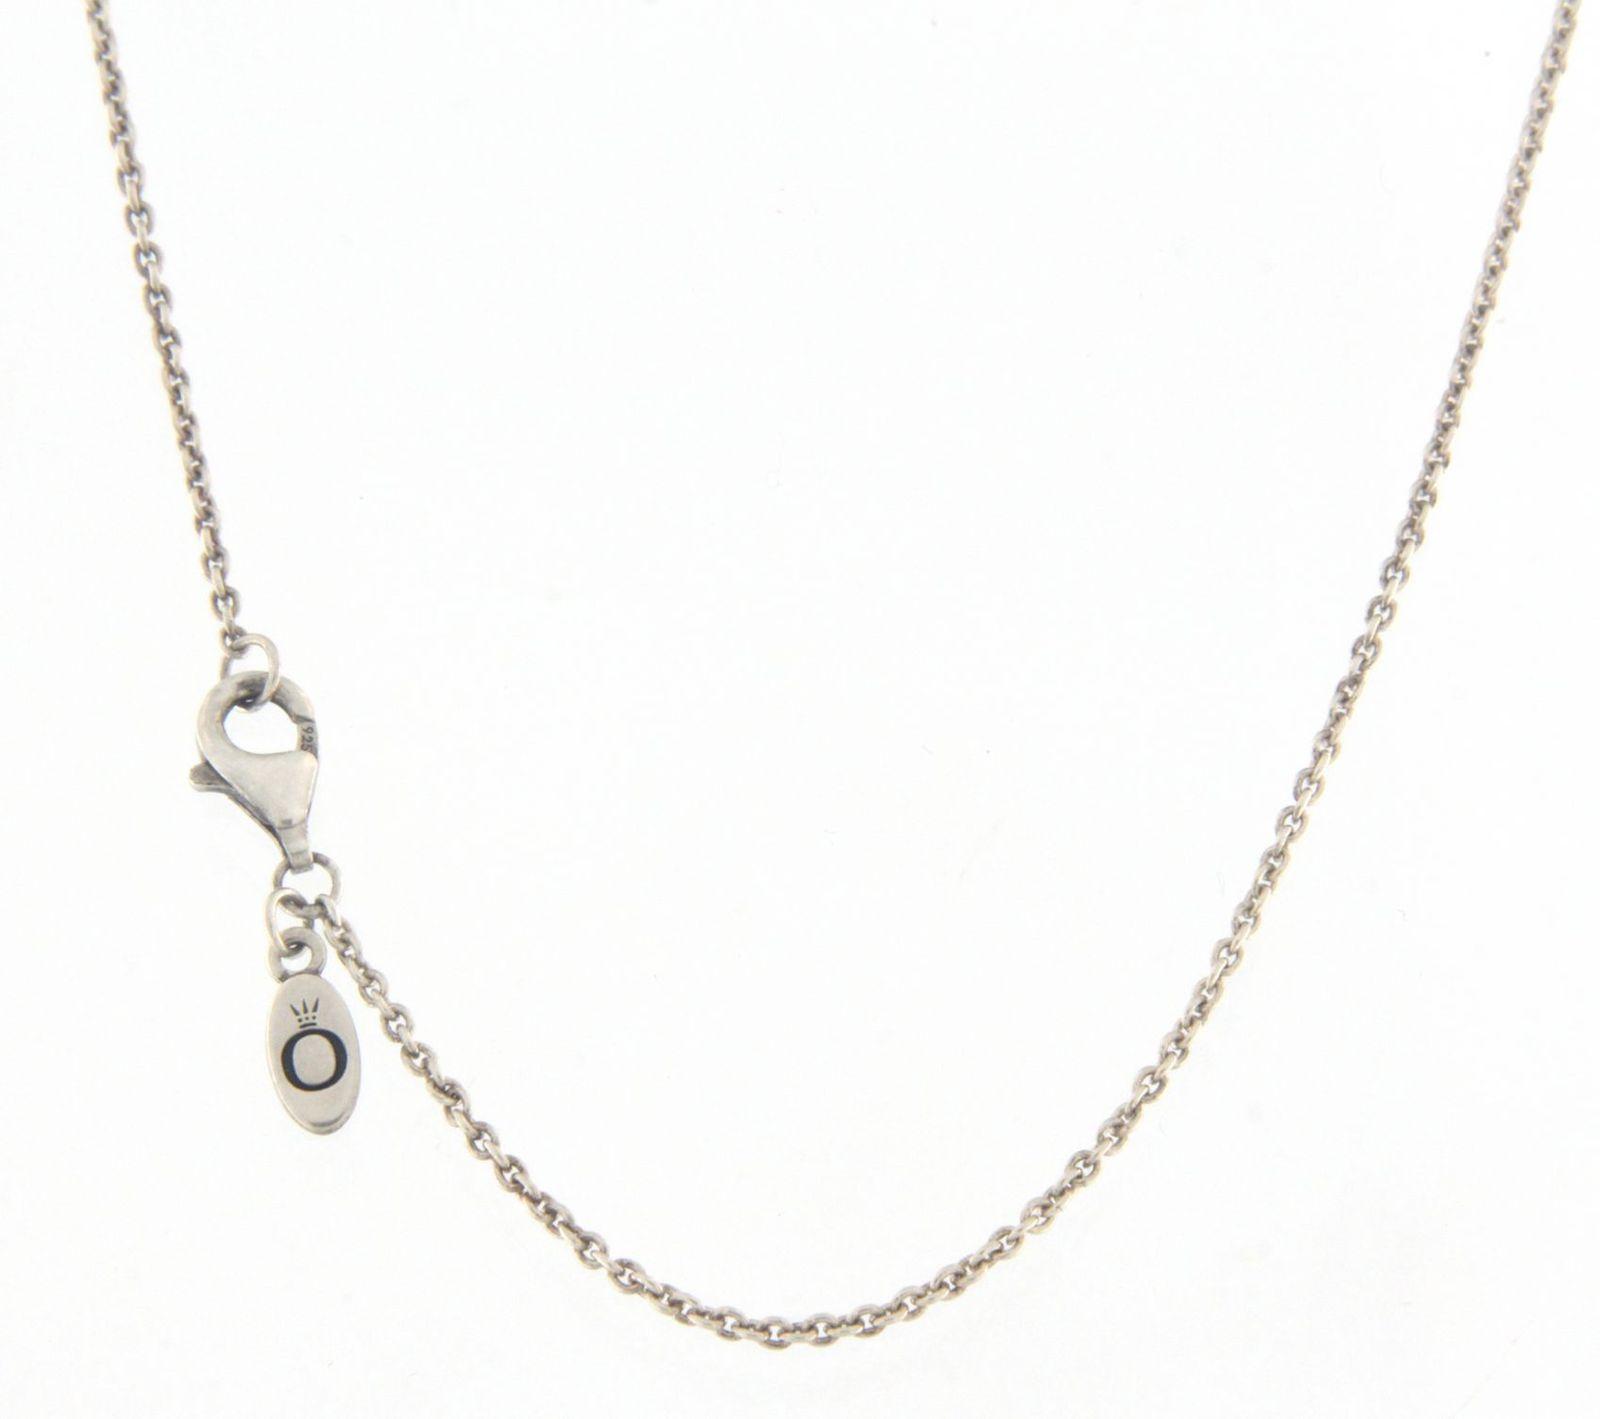 Pandora Women's .925 Silver Chain - $59.00